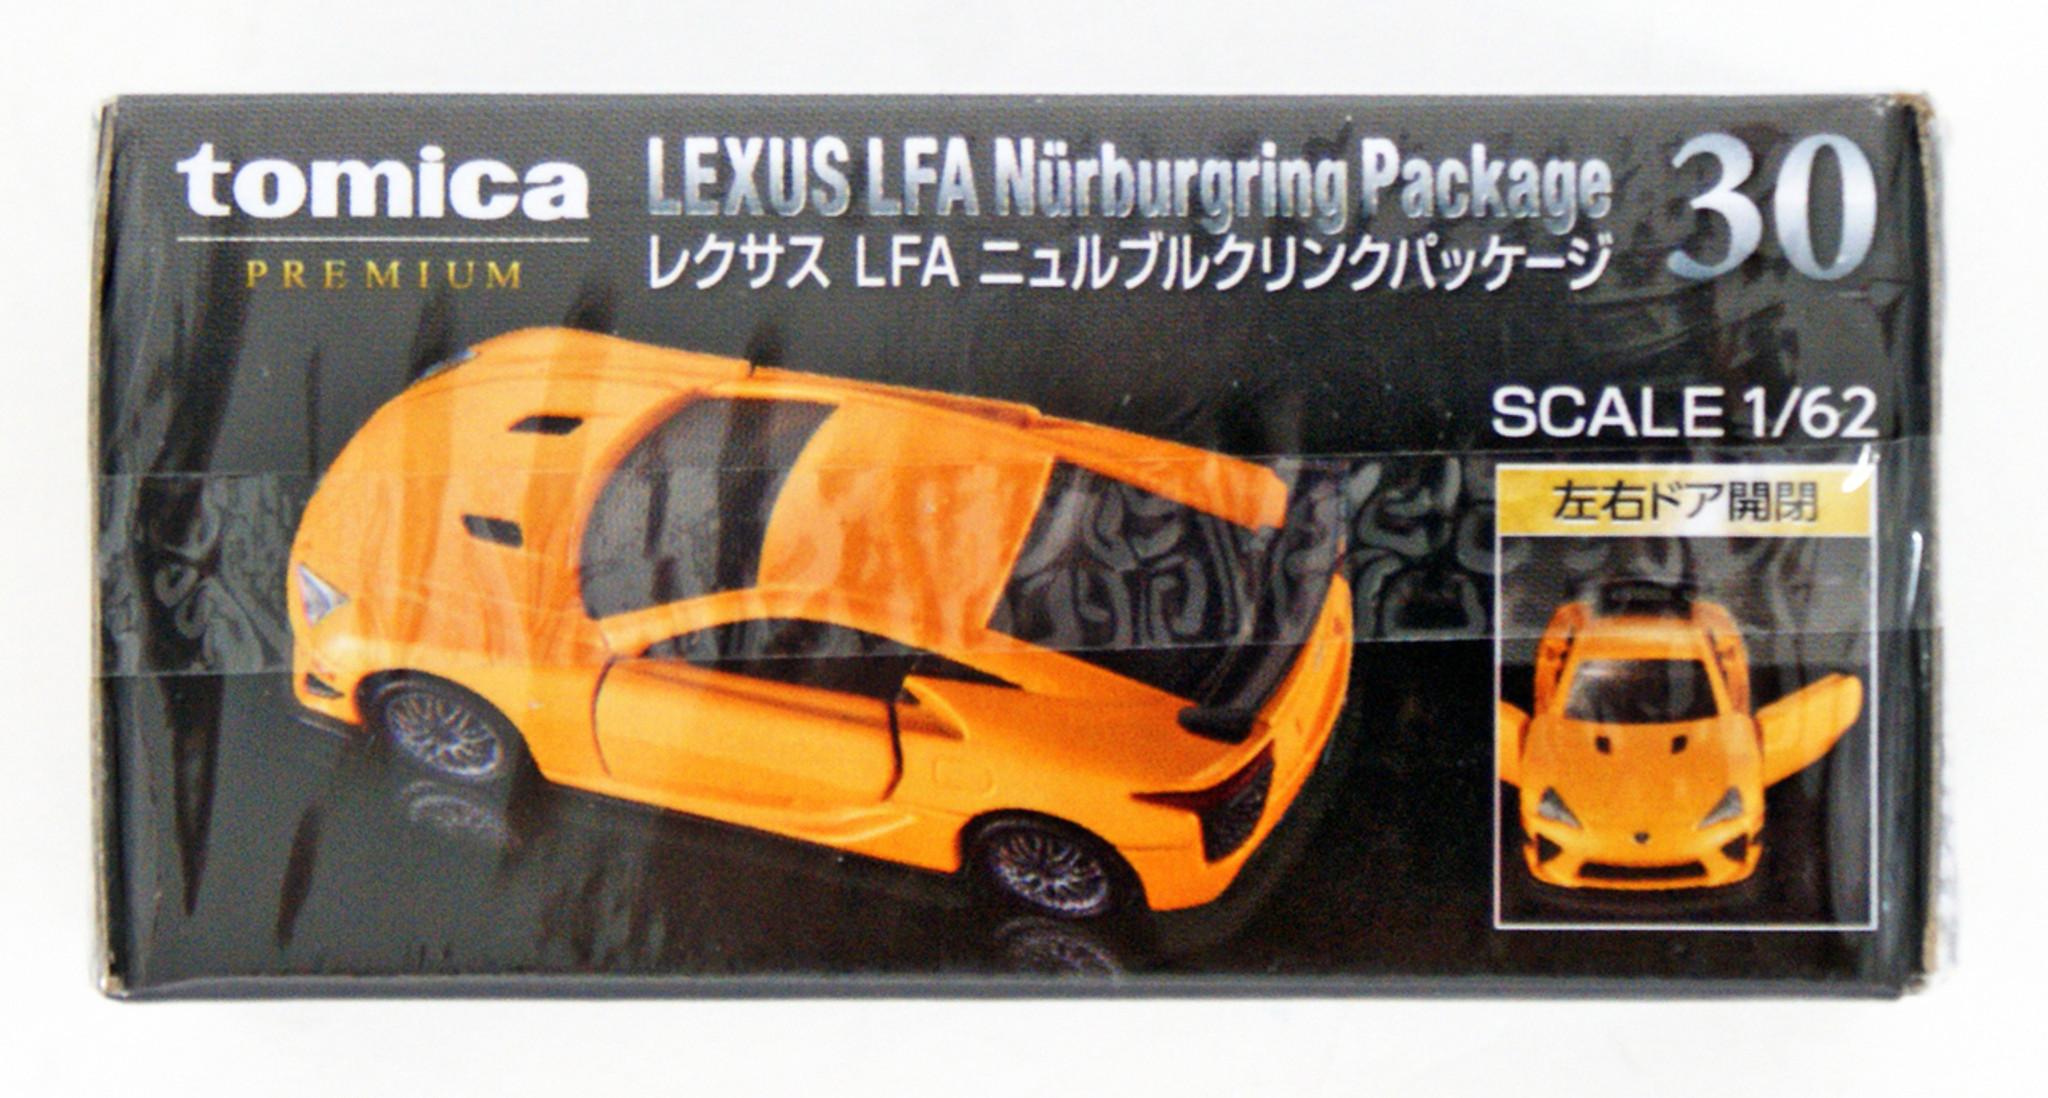 TOMICA PREMIUM 30 LEXUS LFA Nurburgring Package 1//62 TOMY DIECAST CAR NEW 2018